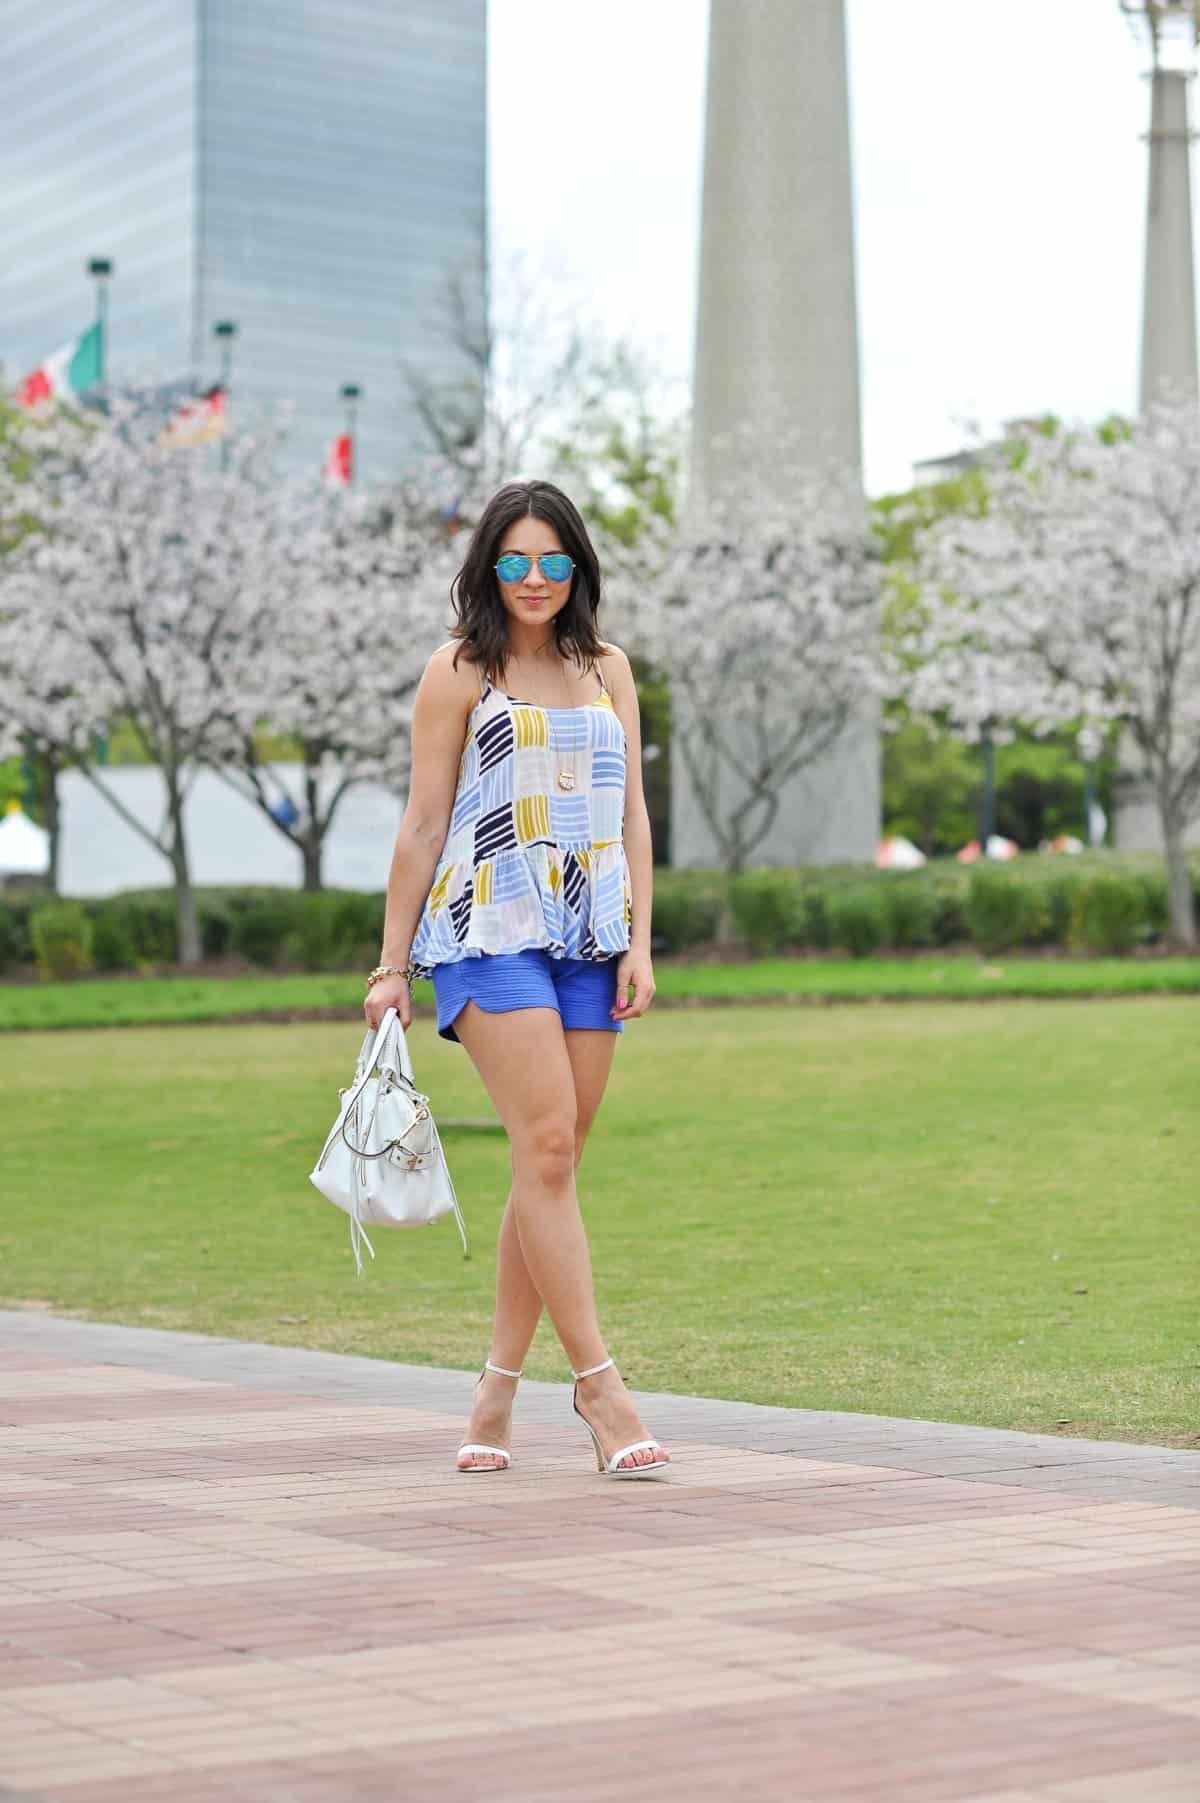 Old Navy printed peplum tank - summer outfit ideas - My Style Vita - @mystylevita - 9